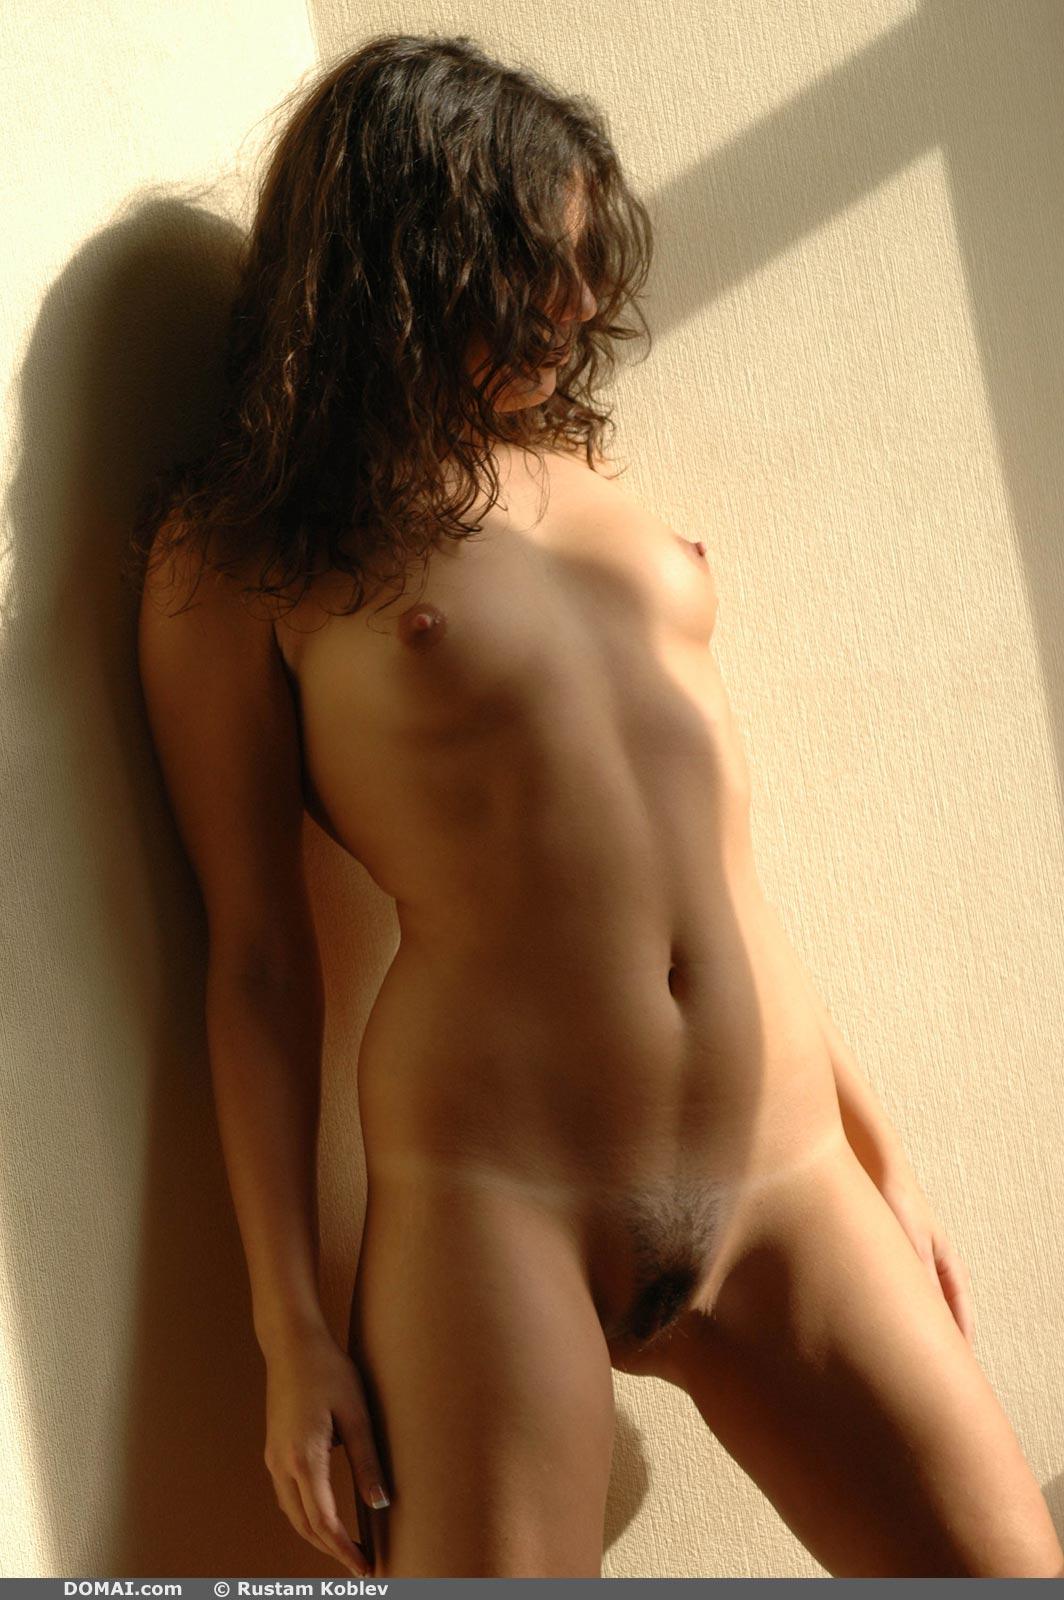 Irisa in Shadow - NudesPuri.com